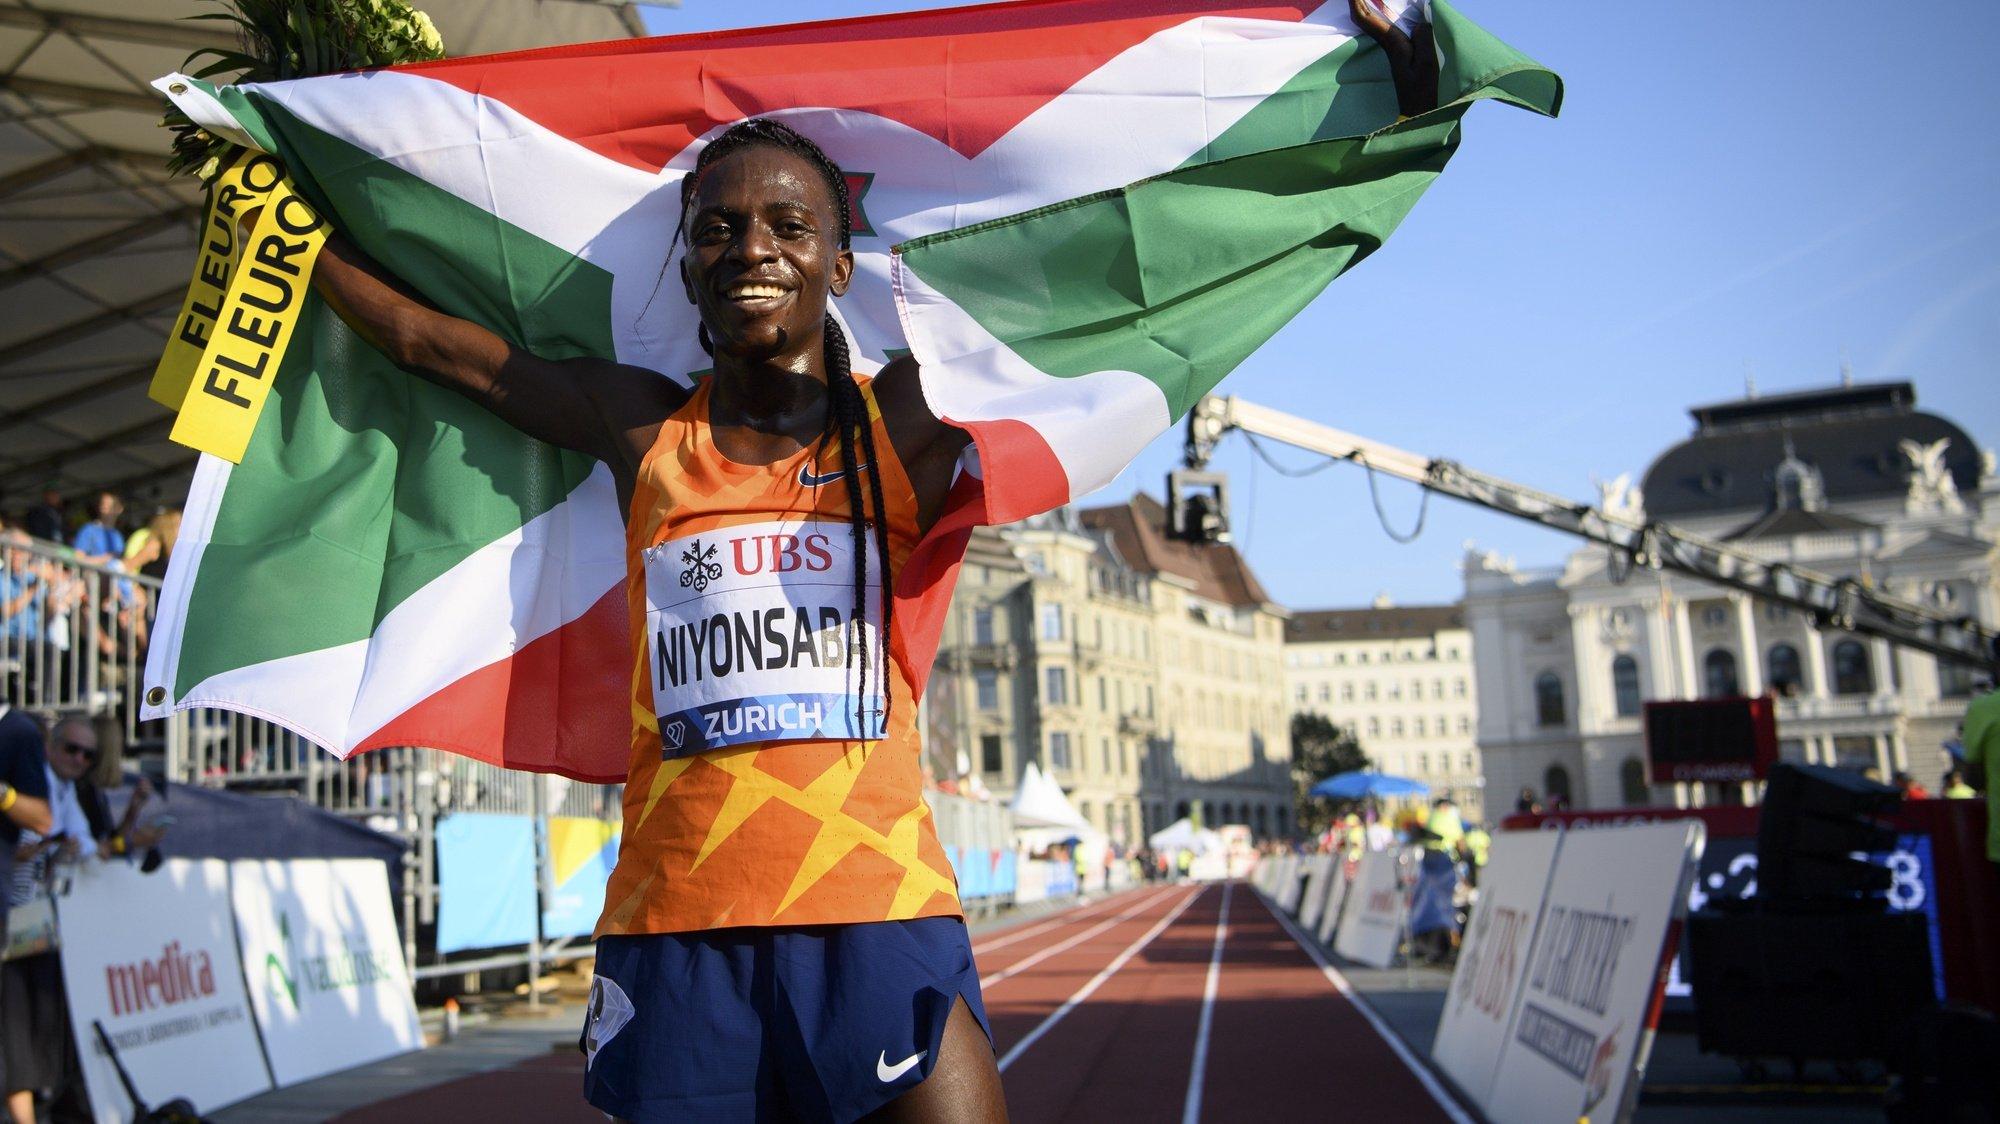 epa09455465 Francine Niyonsaba of Burundi celebrates after winning the women's 5,000m race during the city event of the Weltklasse IAAF Diamond League international athletics meeting on Sechselaeutenplatz in Zurich, Switzerland, 08 September 2021.  EPA/JEAN-CHRISTOPHE BOTT